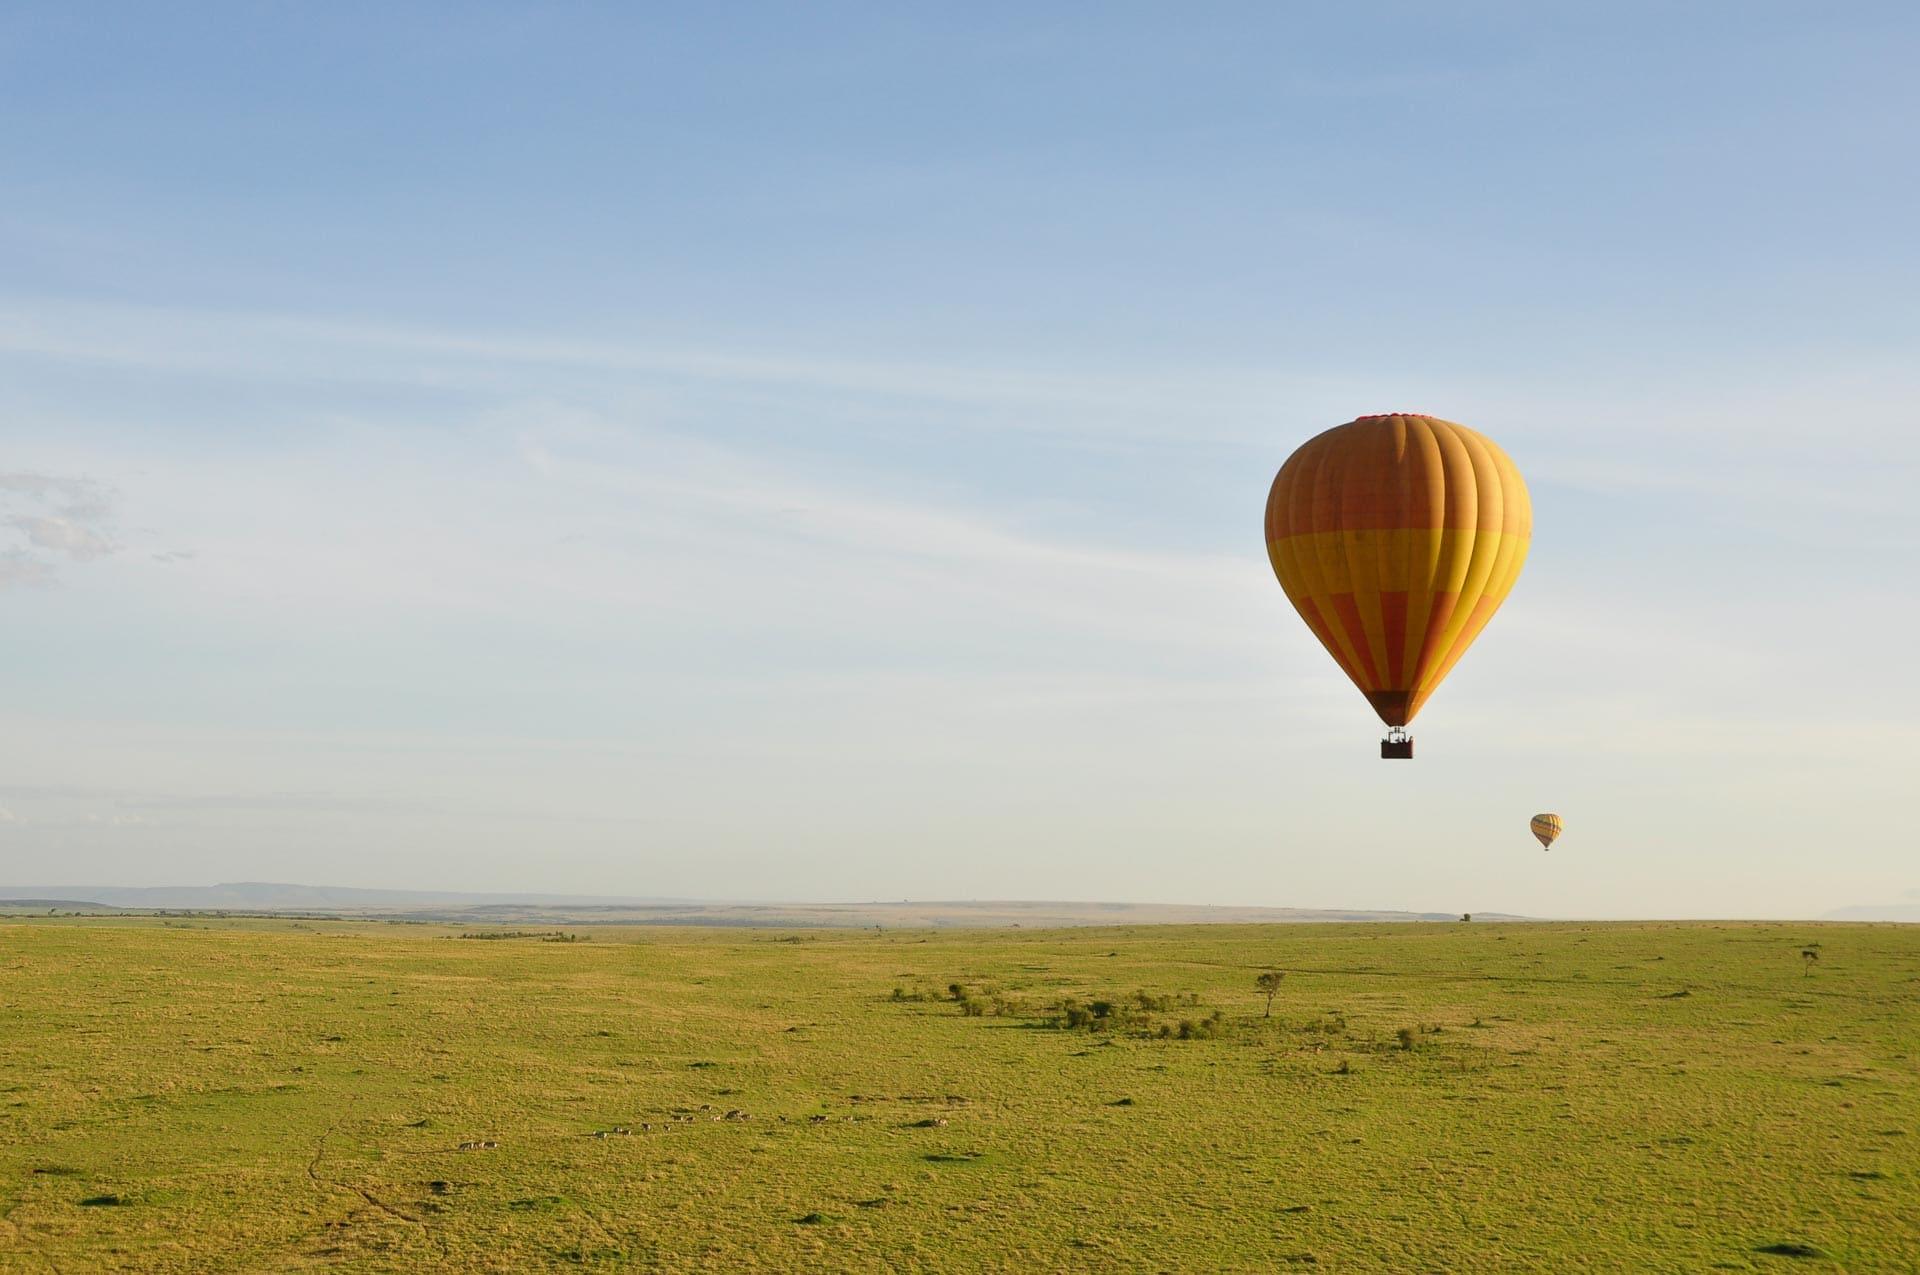 Masai-Mara-Ballonfahrt-Kenia-Globetrotter-Select-20